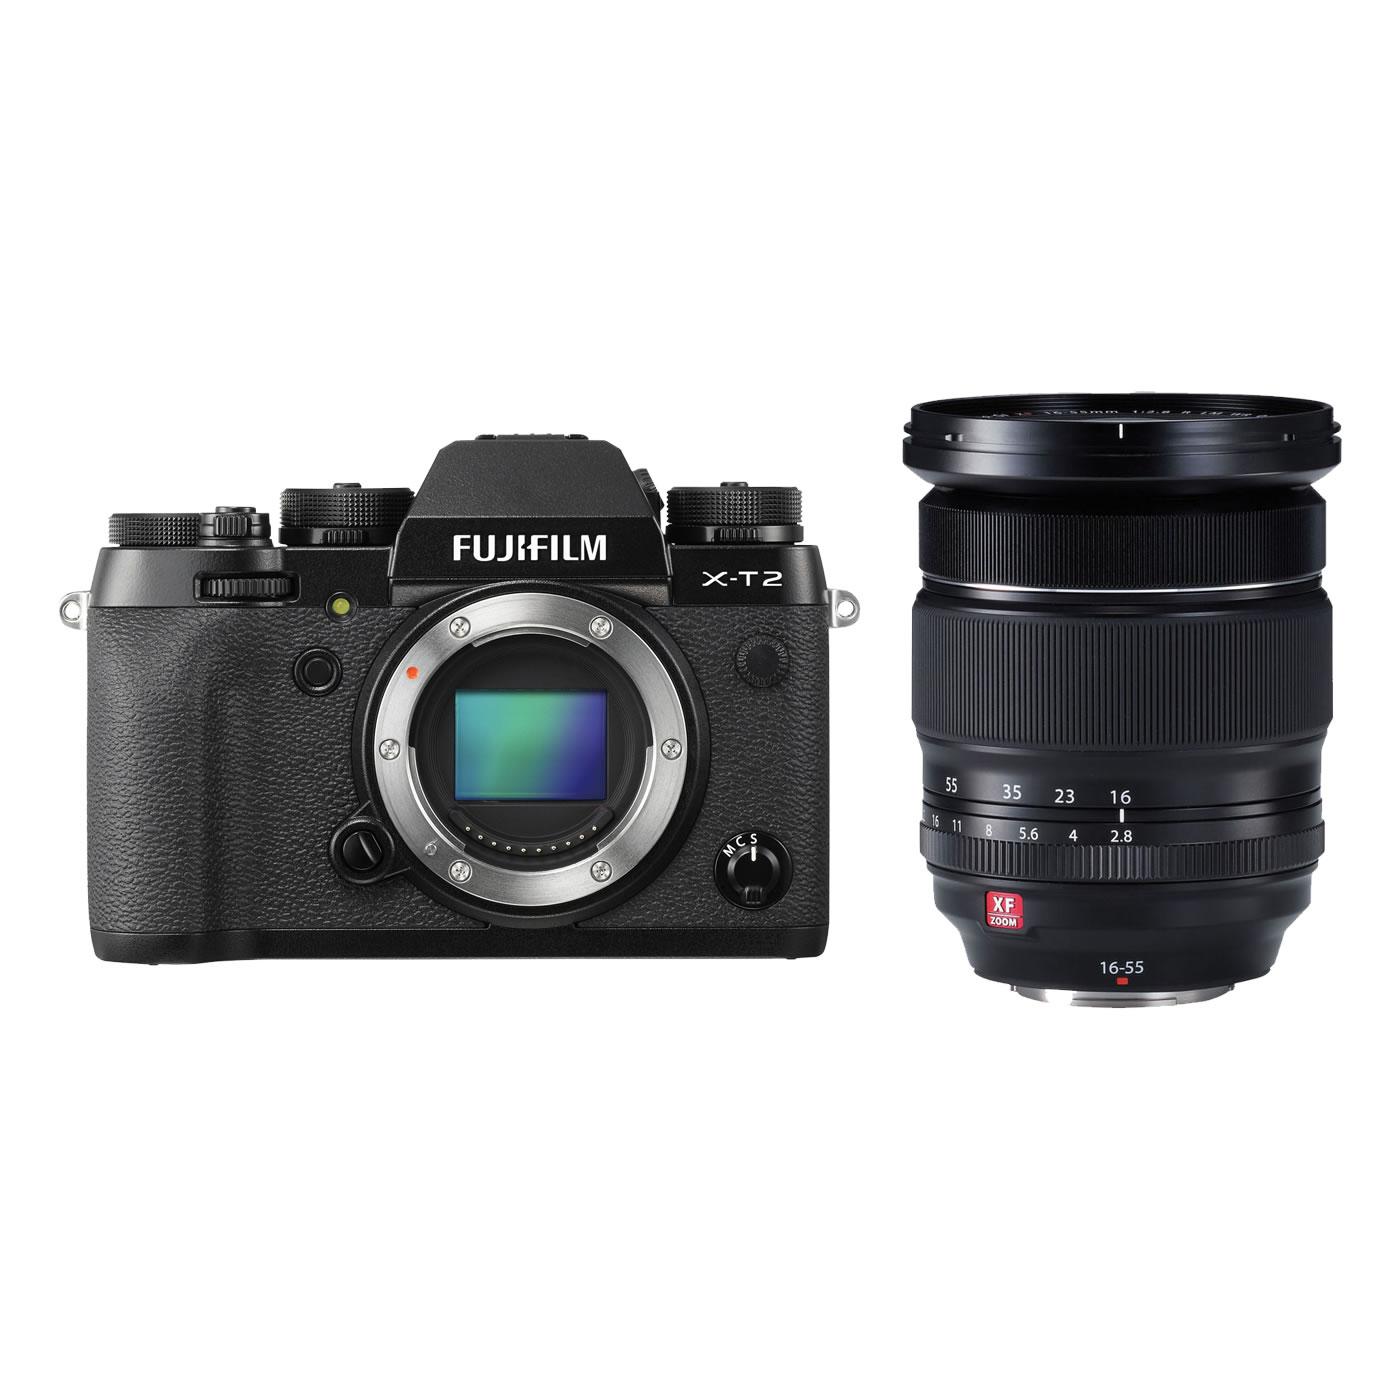 Fujifilm X T2 Kit Schwarz Xf 16 55mm F28 R Lm Wr D10902 Lecuit Body Black